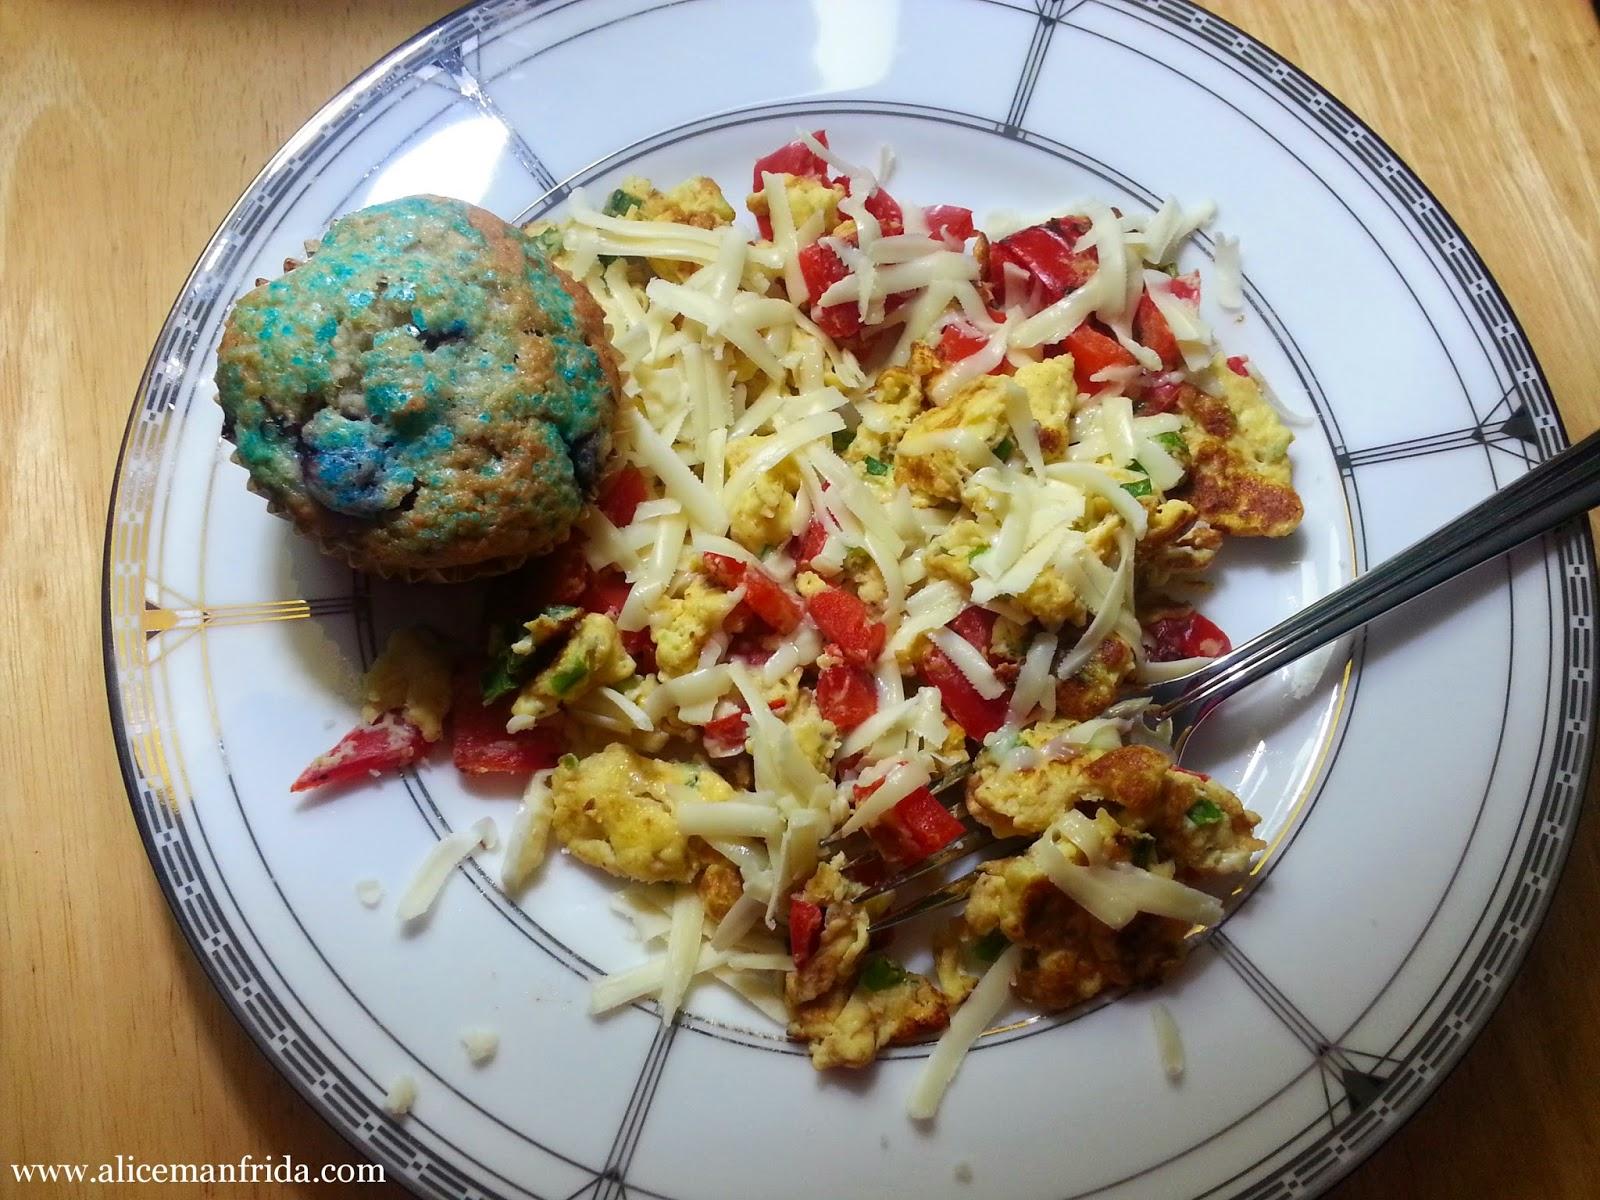 scrambled eggs, blueberry muffins